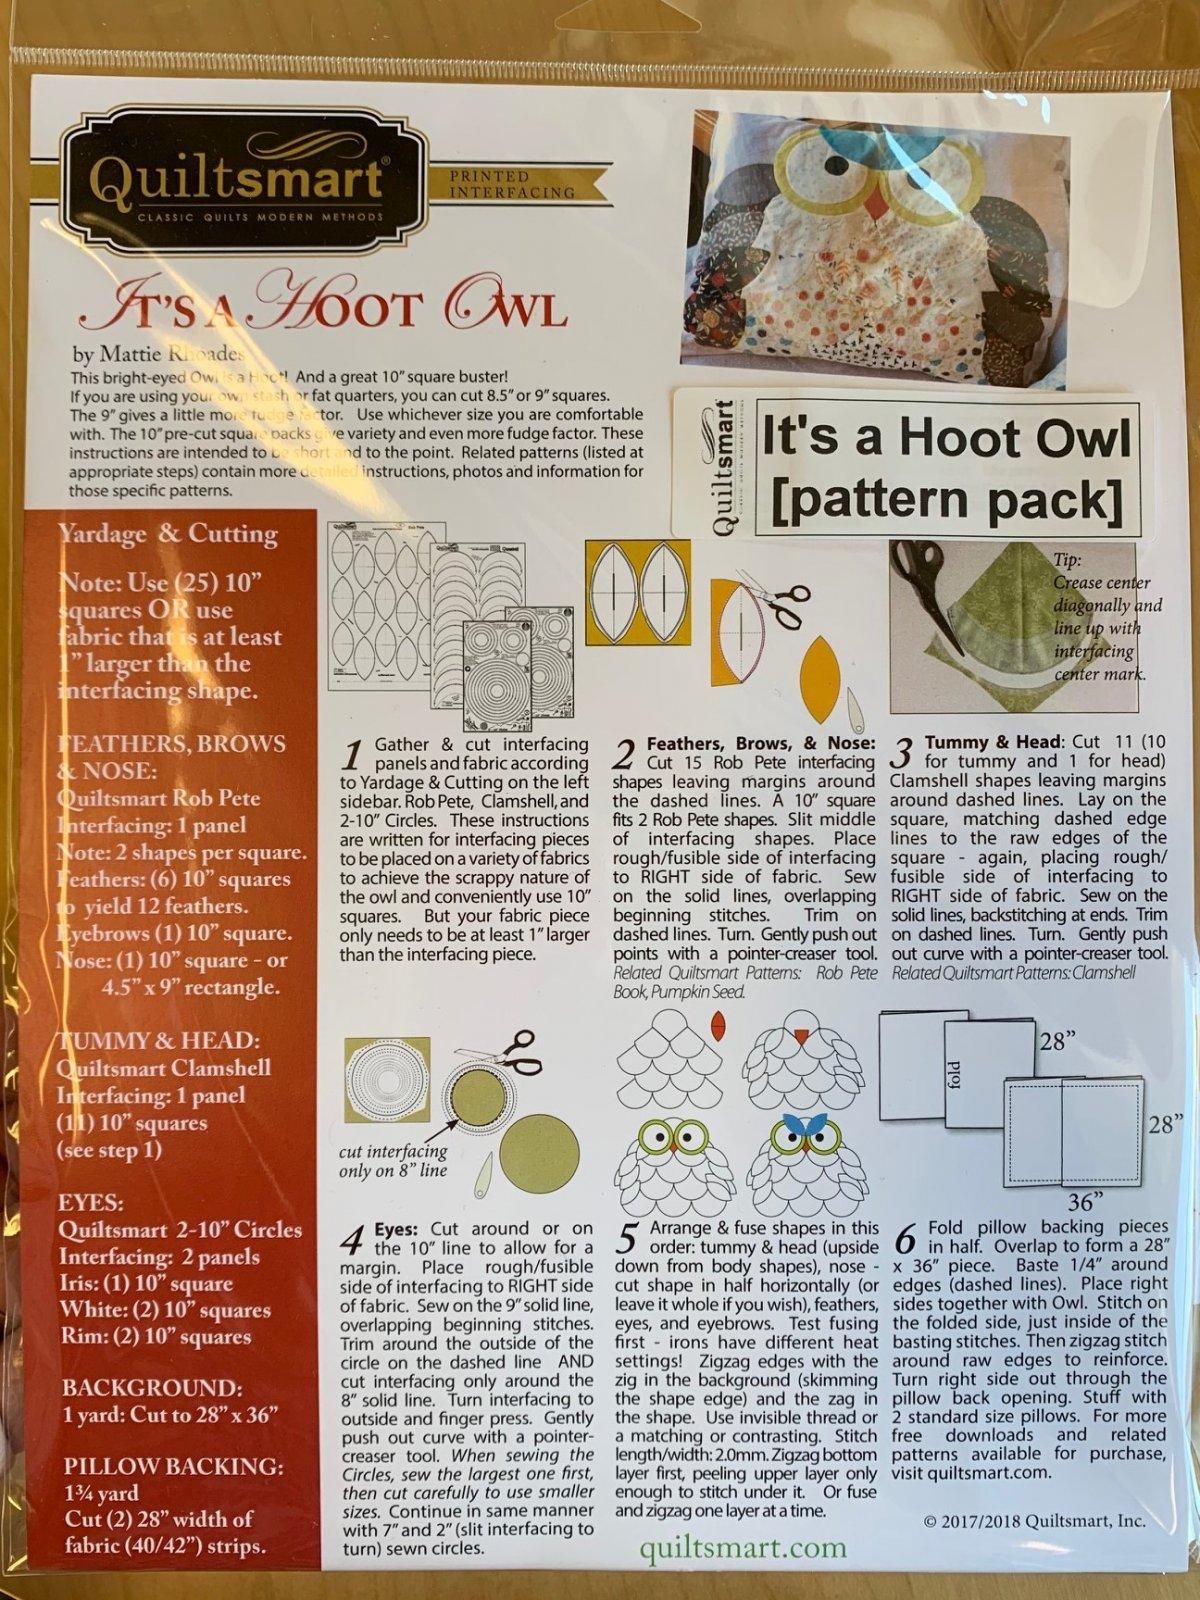 It's a Hoot Owl Pattern Pack